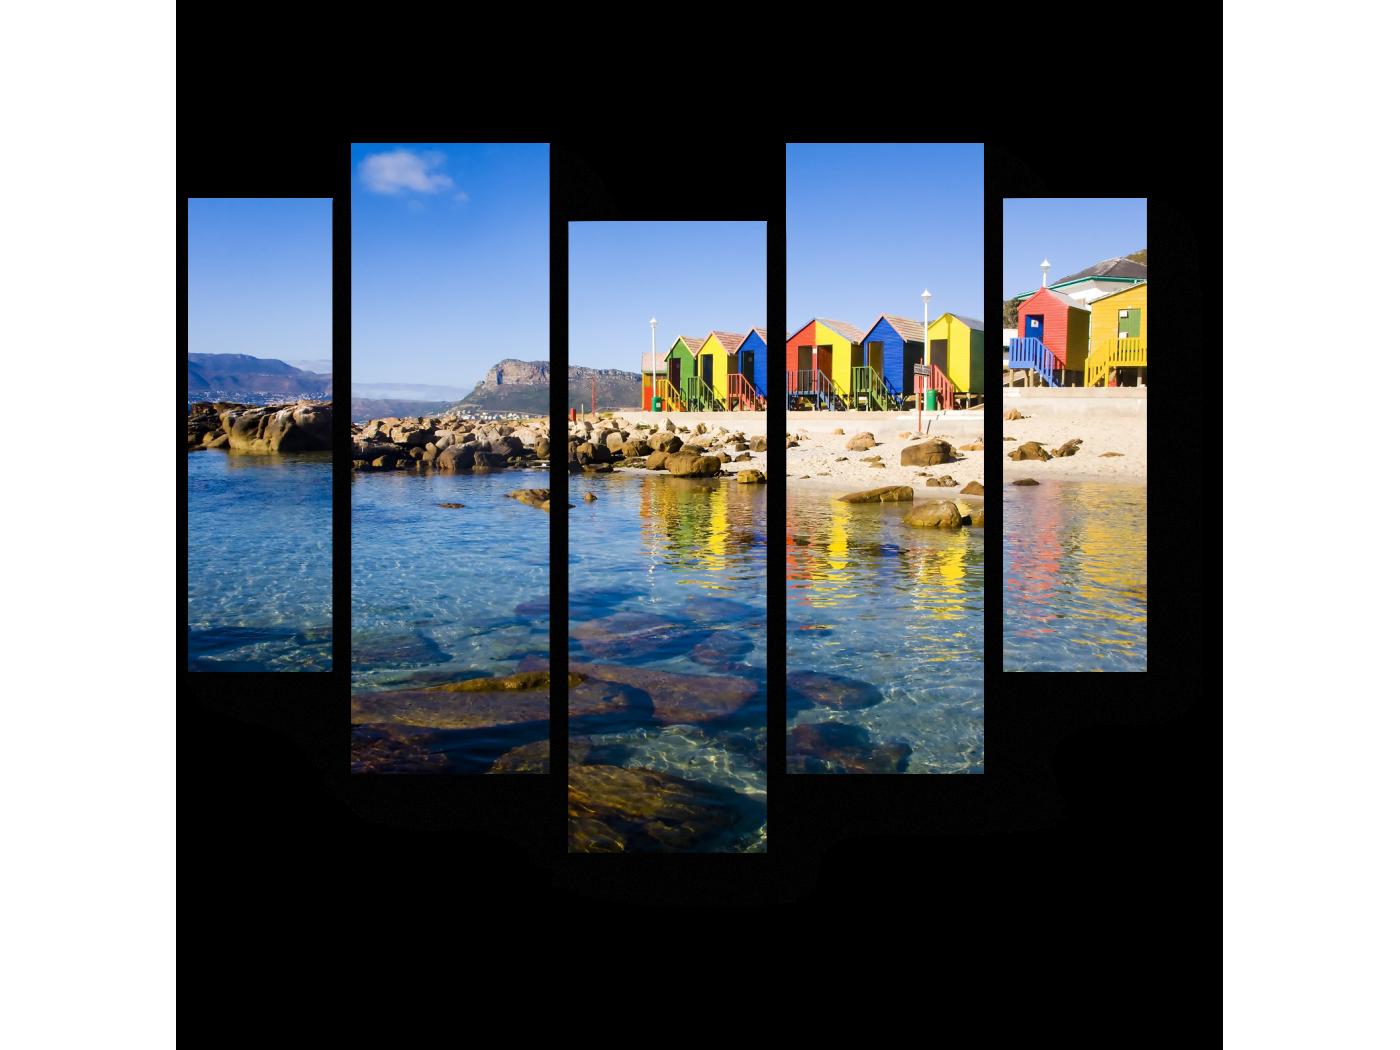 Модульная картина Пустынный пляж, Кейптаун (101x82) фото